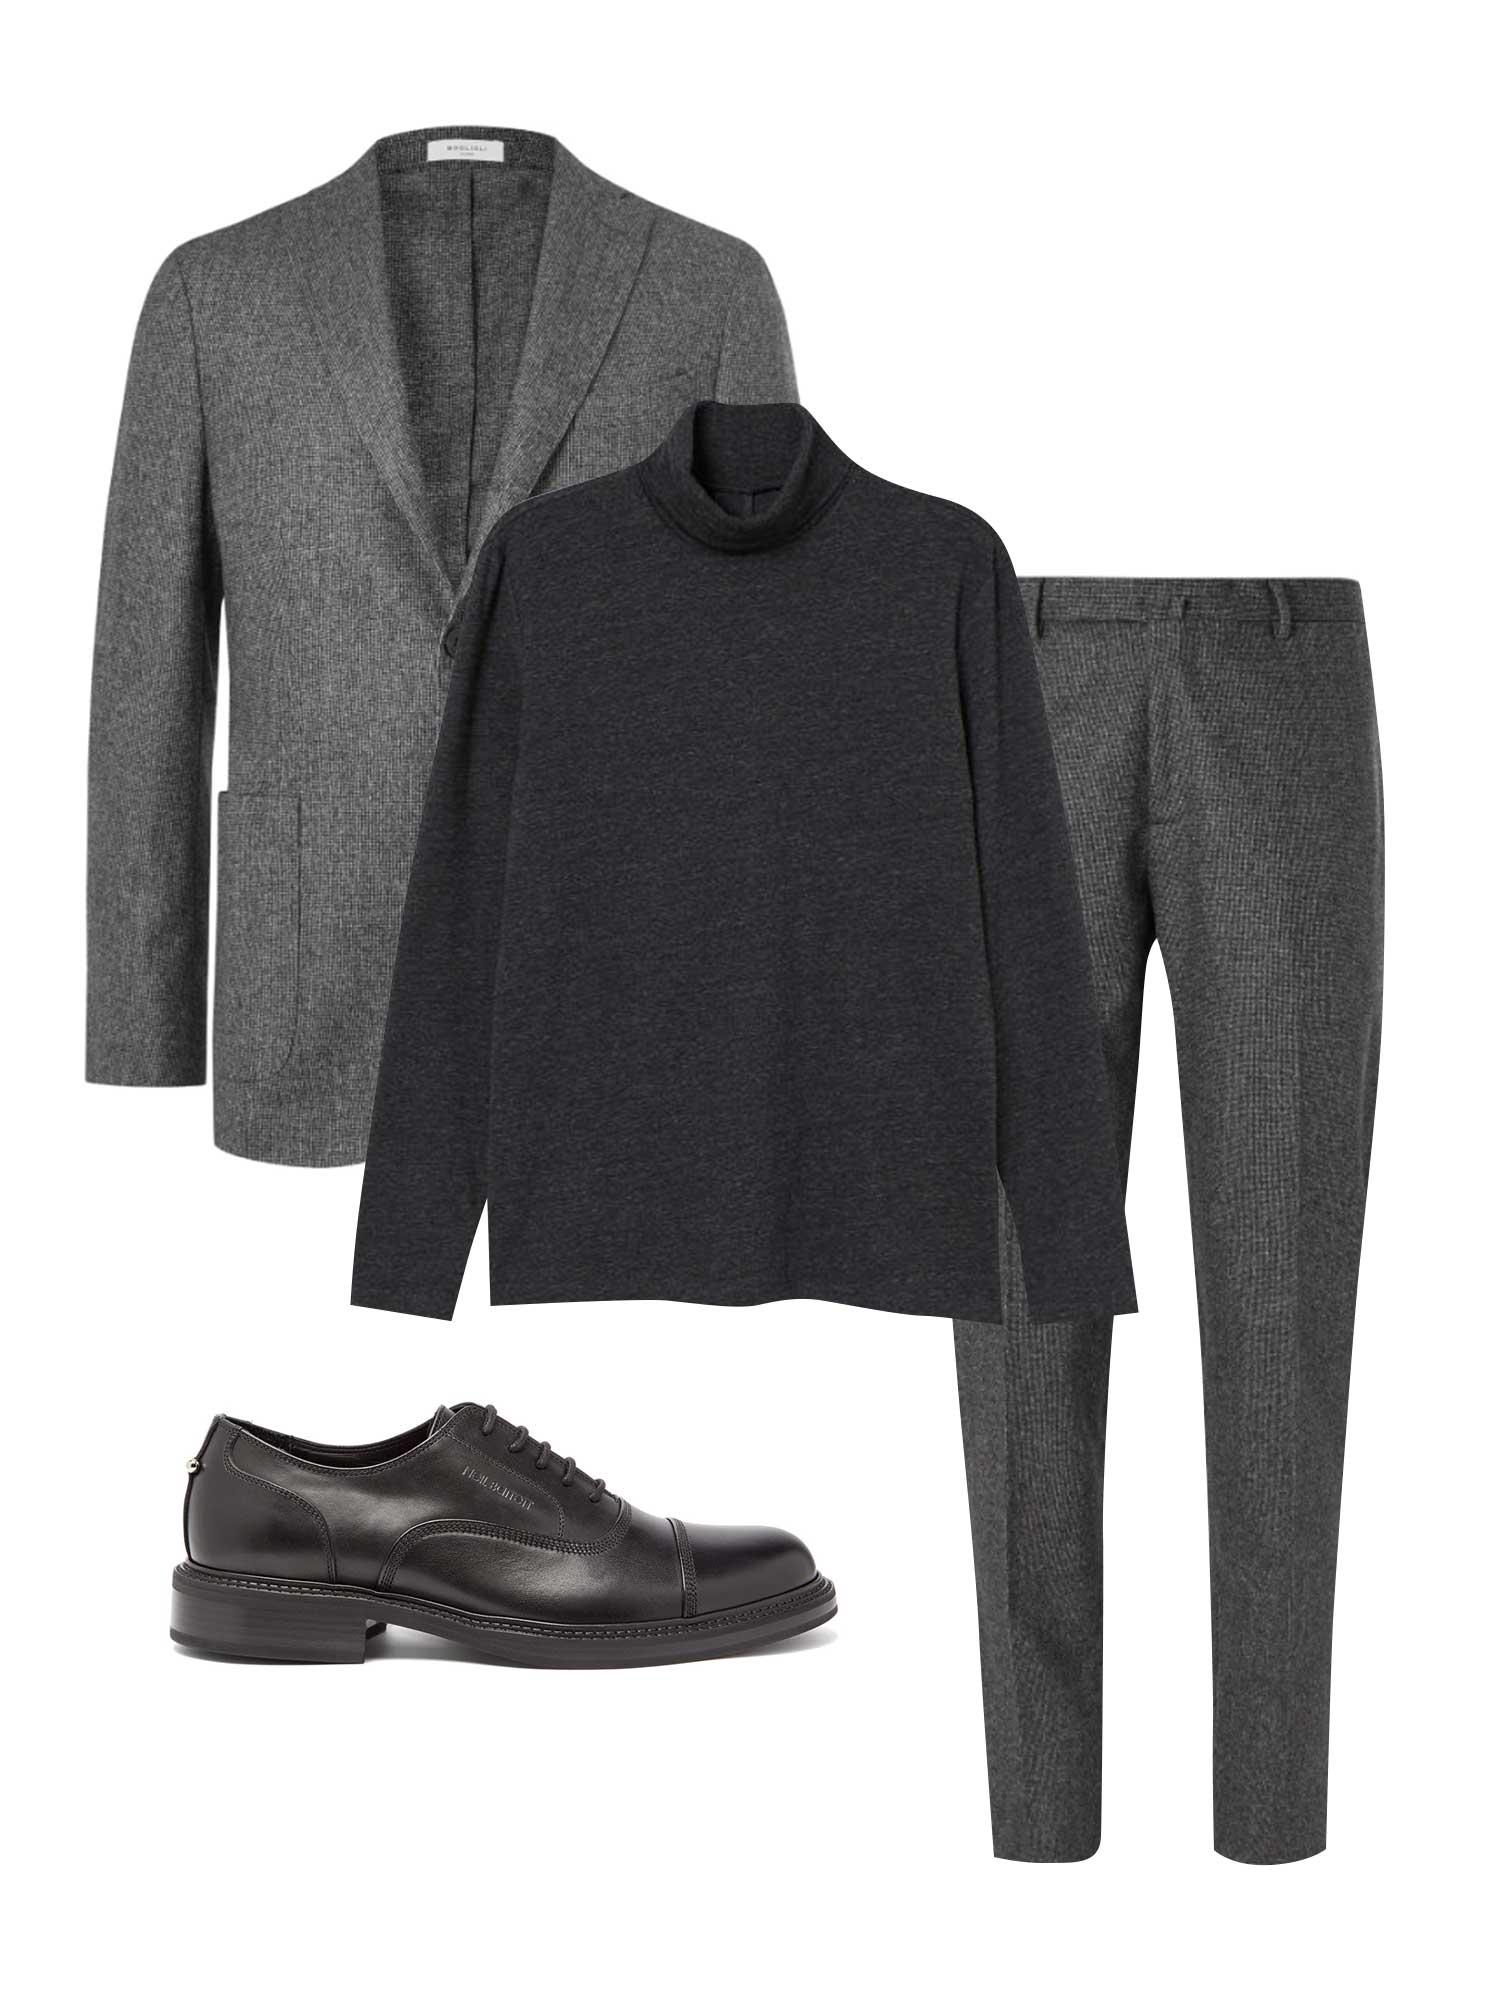 Пиджак Boglioli, €714; брюки Boglioli, €279; водолазка H&M, 1199 рублей; обувь Neil Barrett, €401